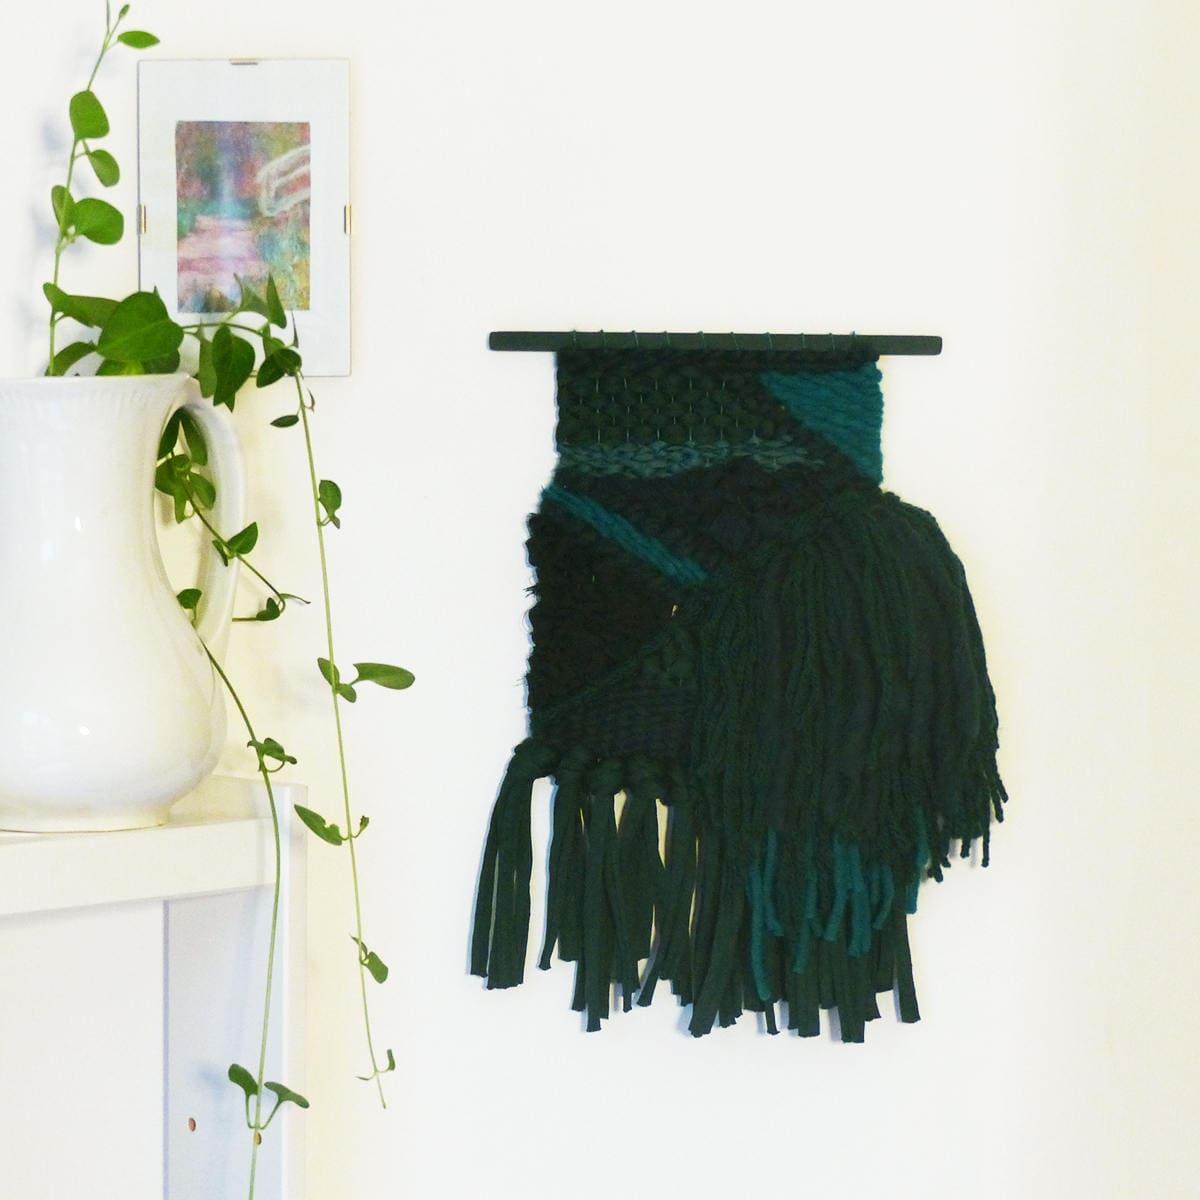 Baguette En Bois Decorative green wall weaving, woven wall decor, bohemian decorative wall hanging,  fiber art, gift for home, woven, decoration, nayquach